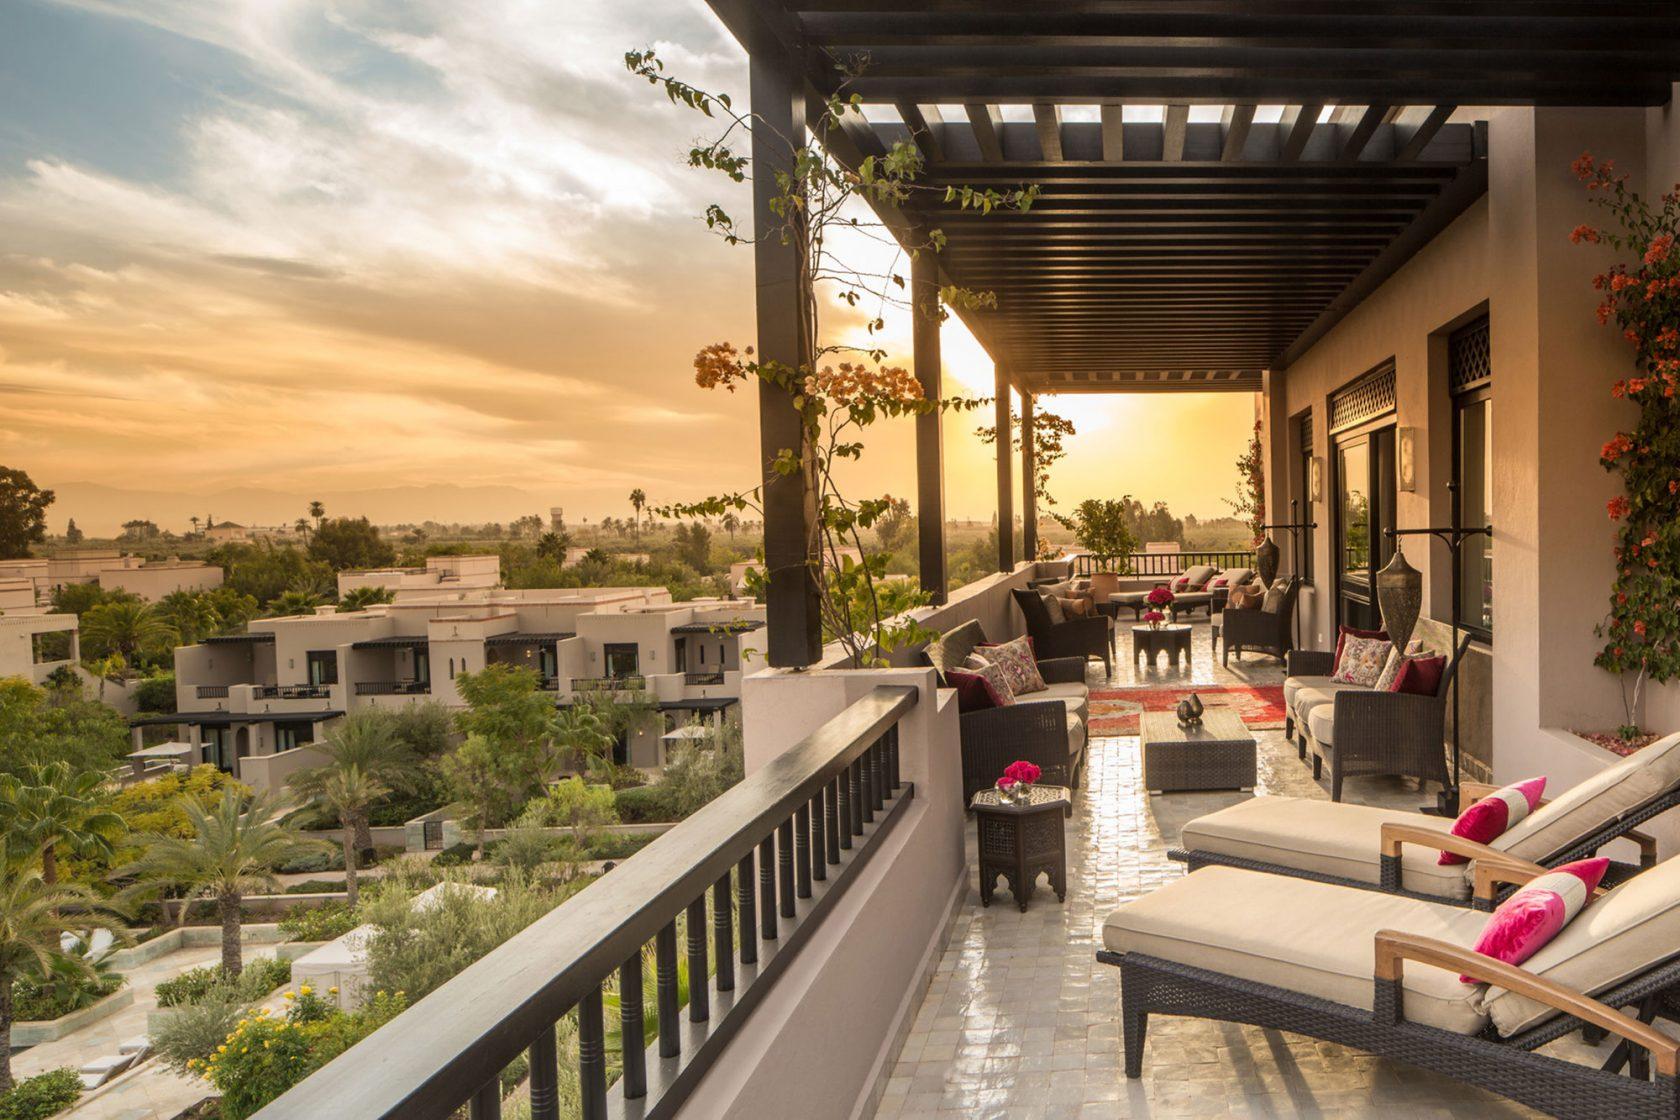 Four Seasons Marrakesch Presidential Suite Terrace